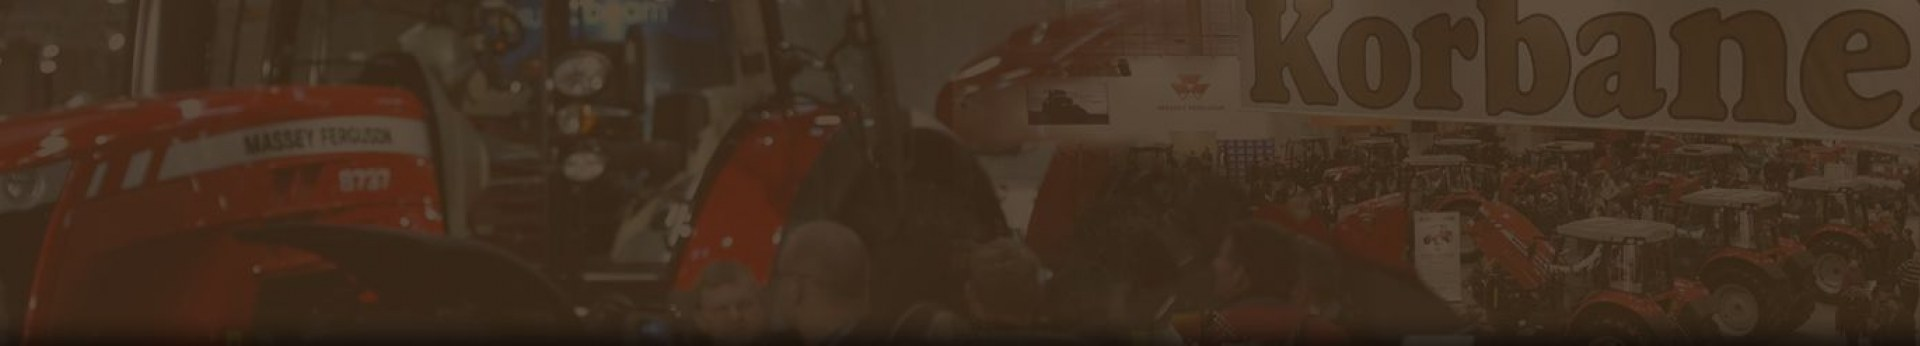 targi pokazy wystawa korbanek